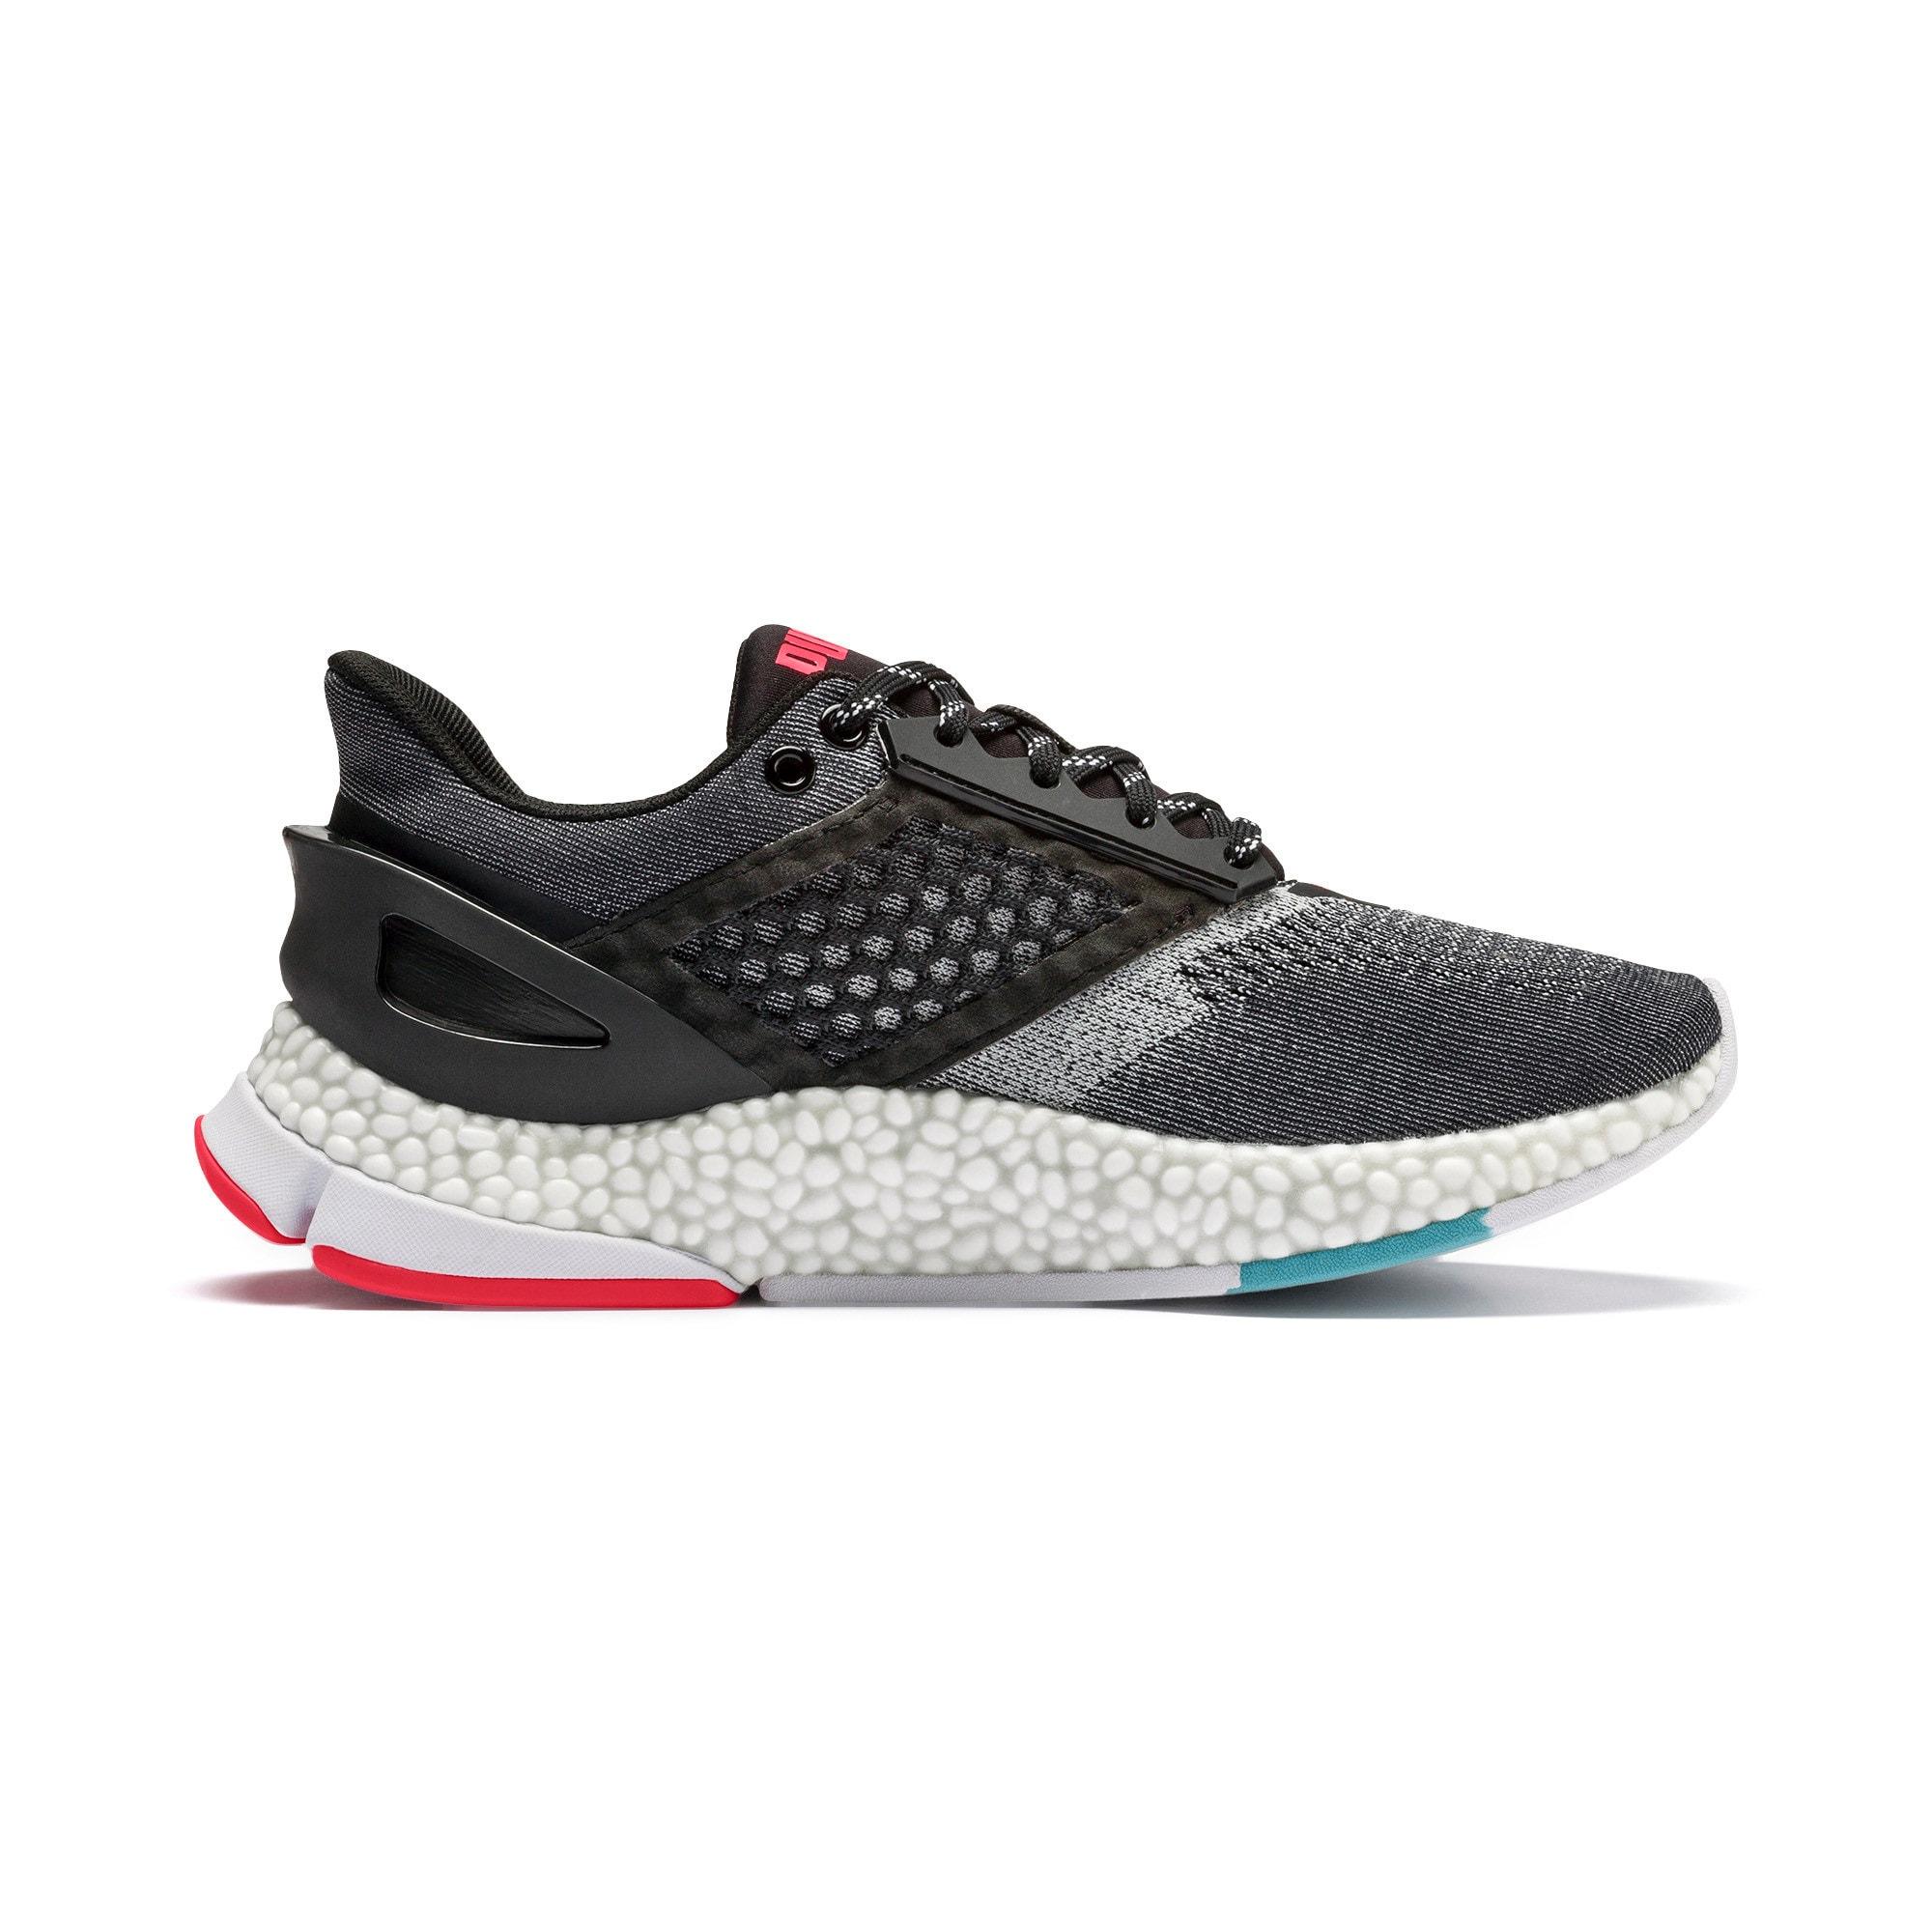 Thumbnail 8 of HYBRID Astro Women's Running Shoes, Puma Black-Pink Alert, medium